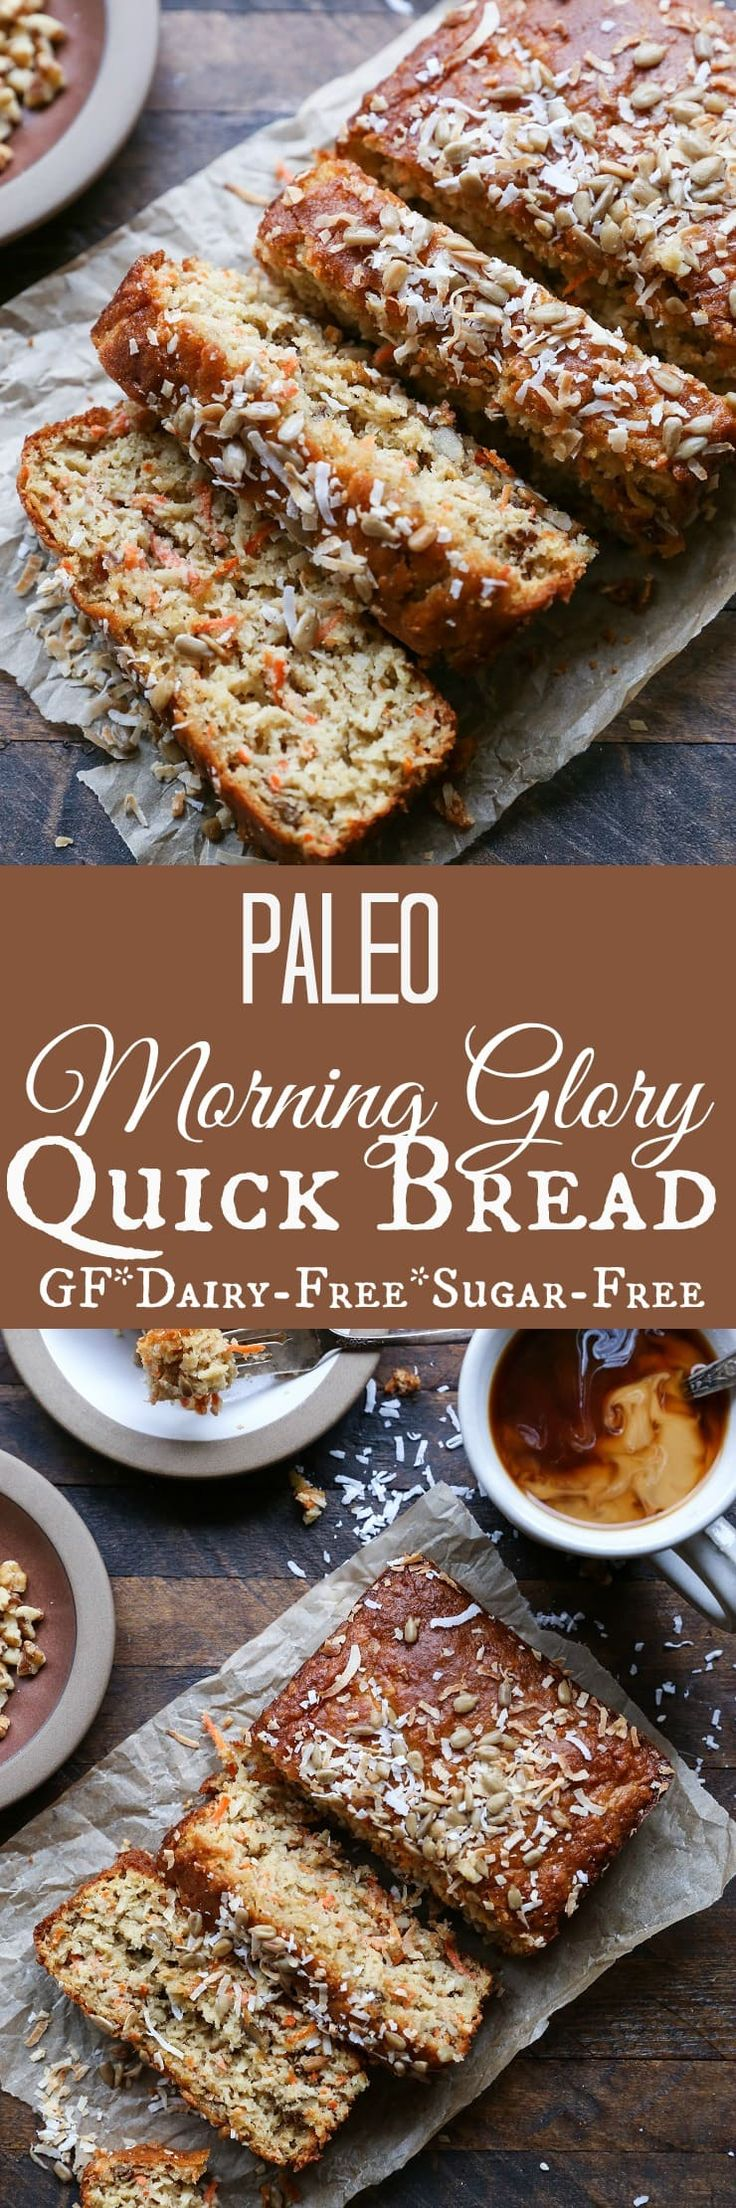 Paleo Morning Glory Quick Bread - a grain-free, refined sugar-free, and healthy recipe